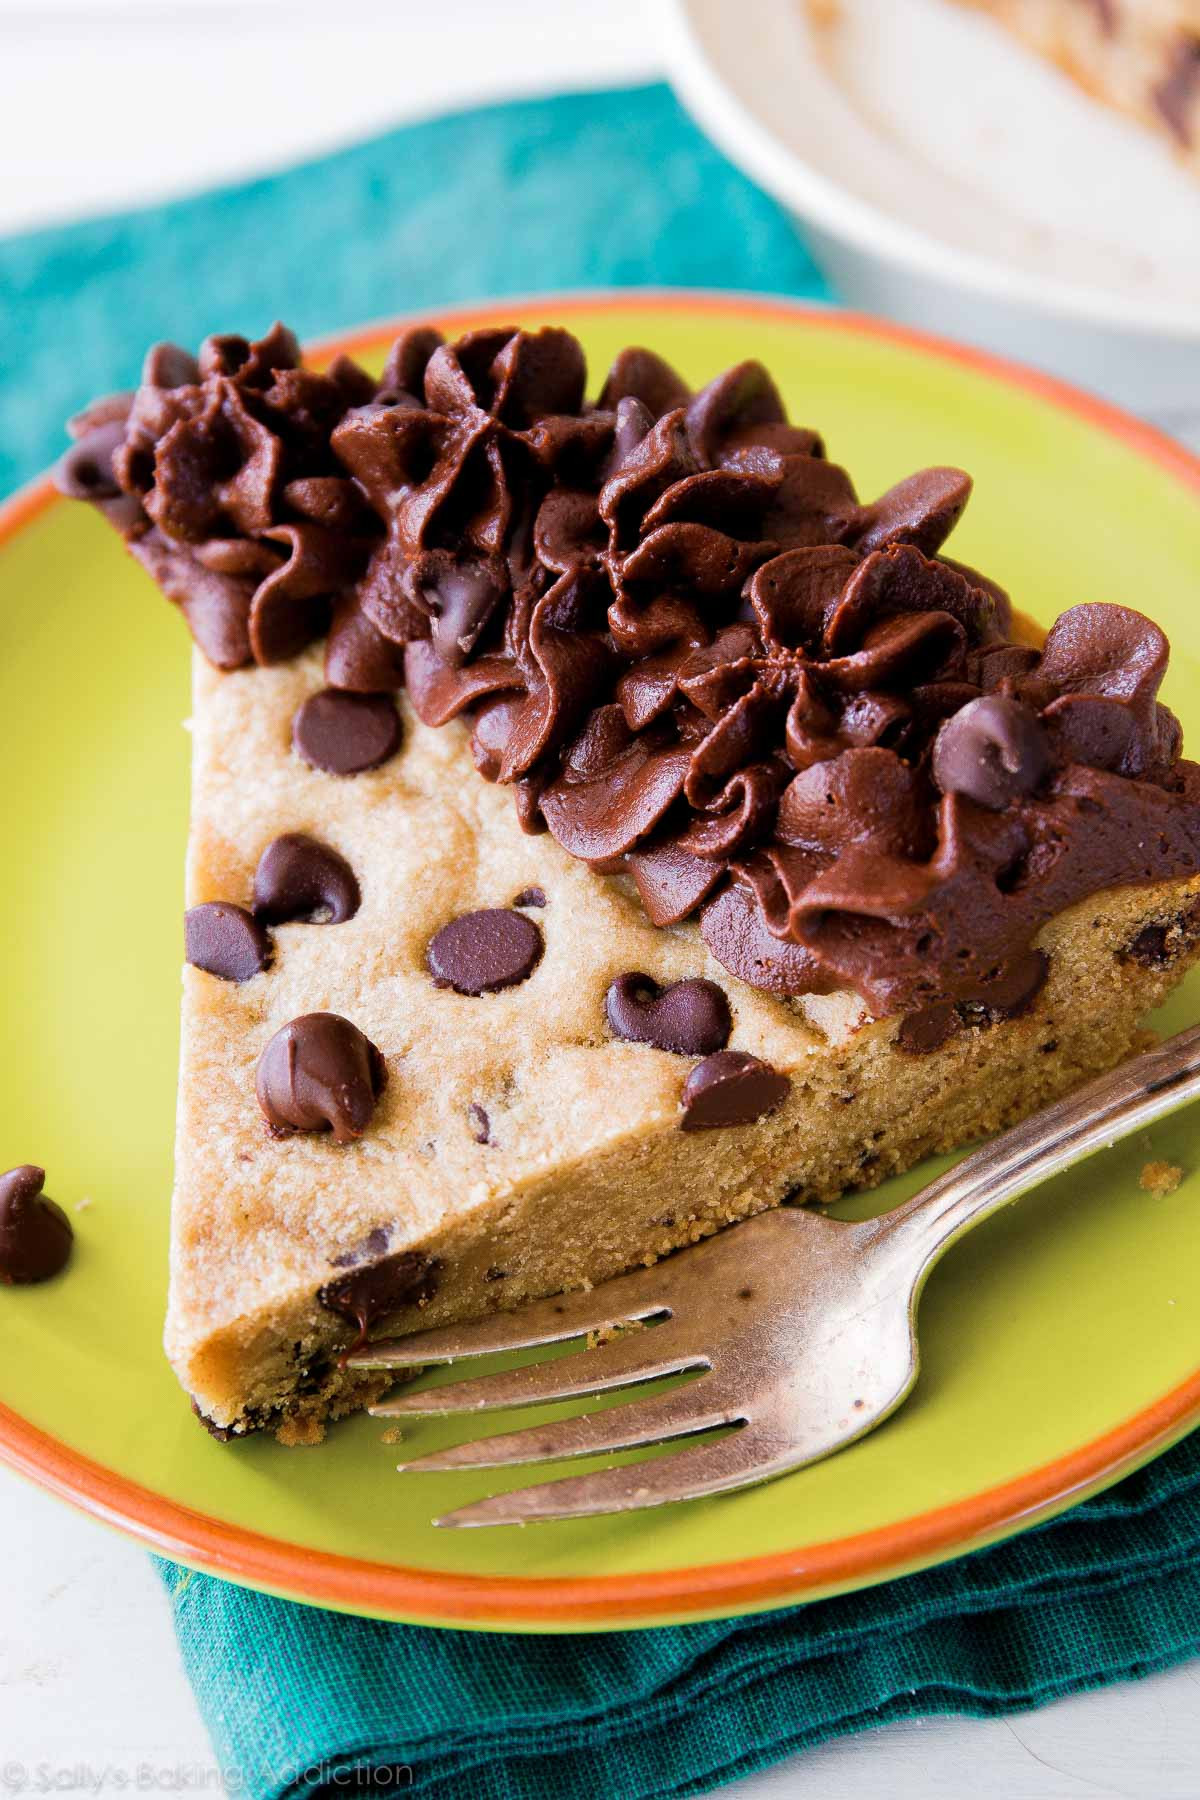 Chocolate Chip Cookie Cake  Chocolate Chip Cookie Cake Sallys Baking Addiction